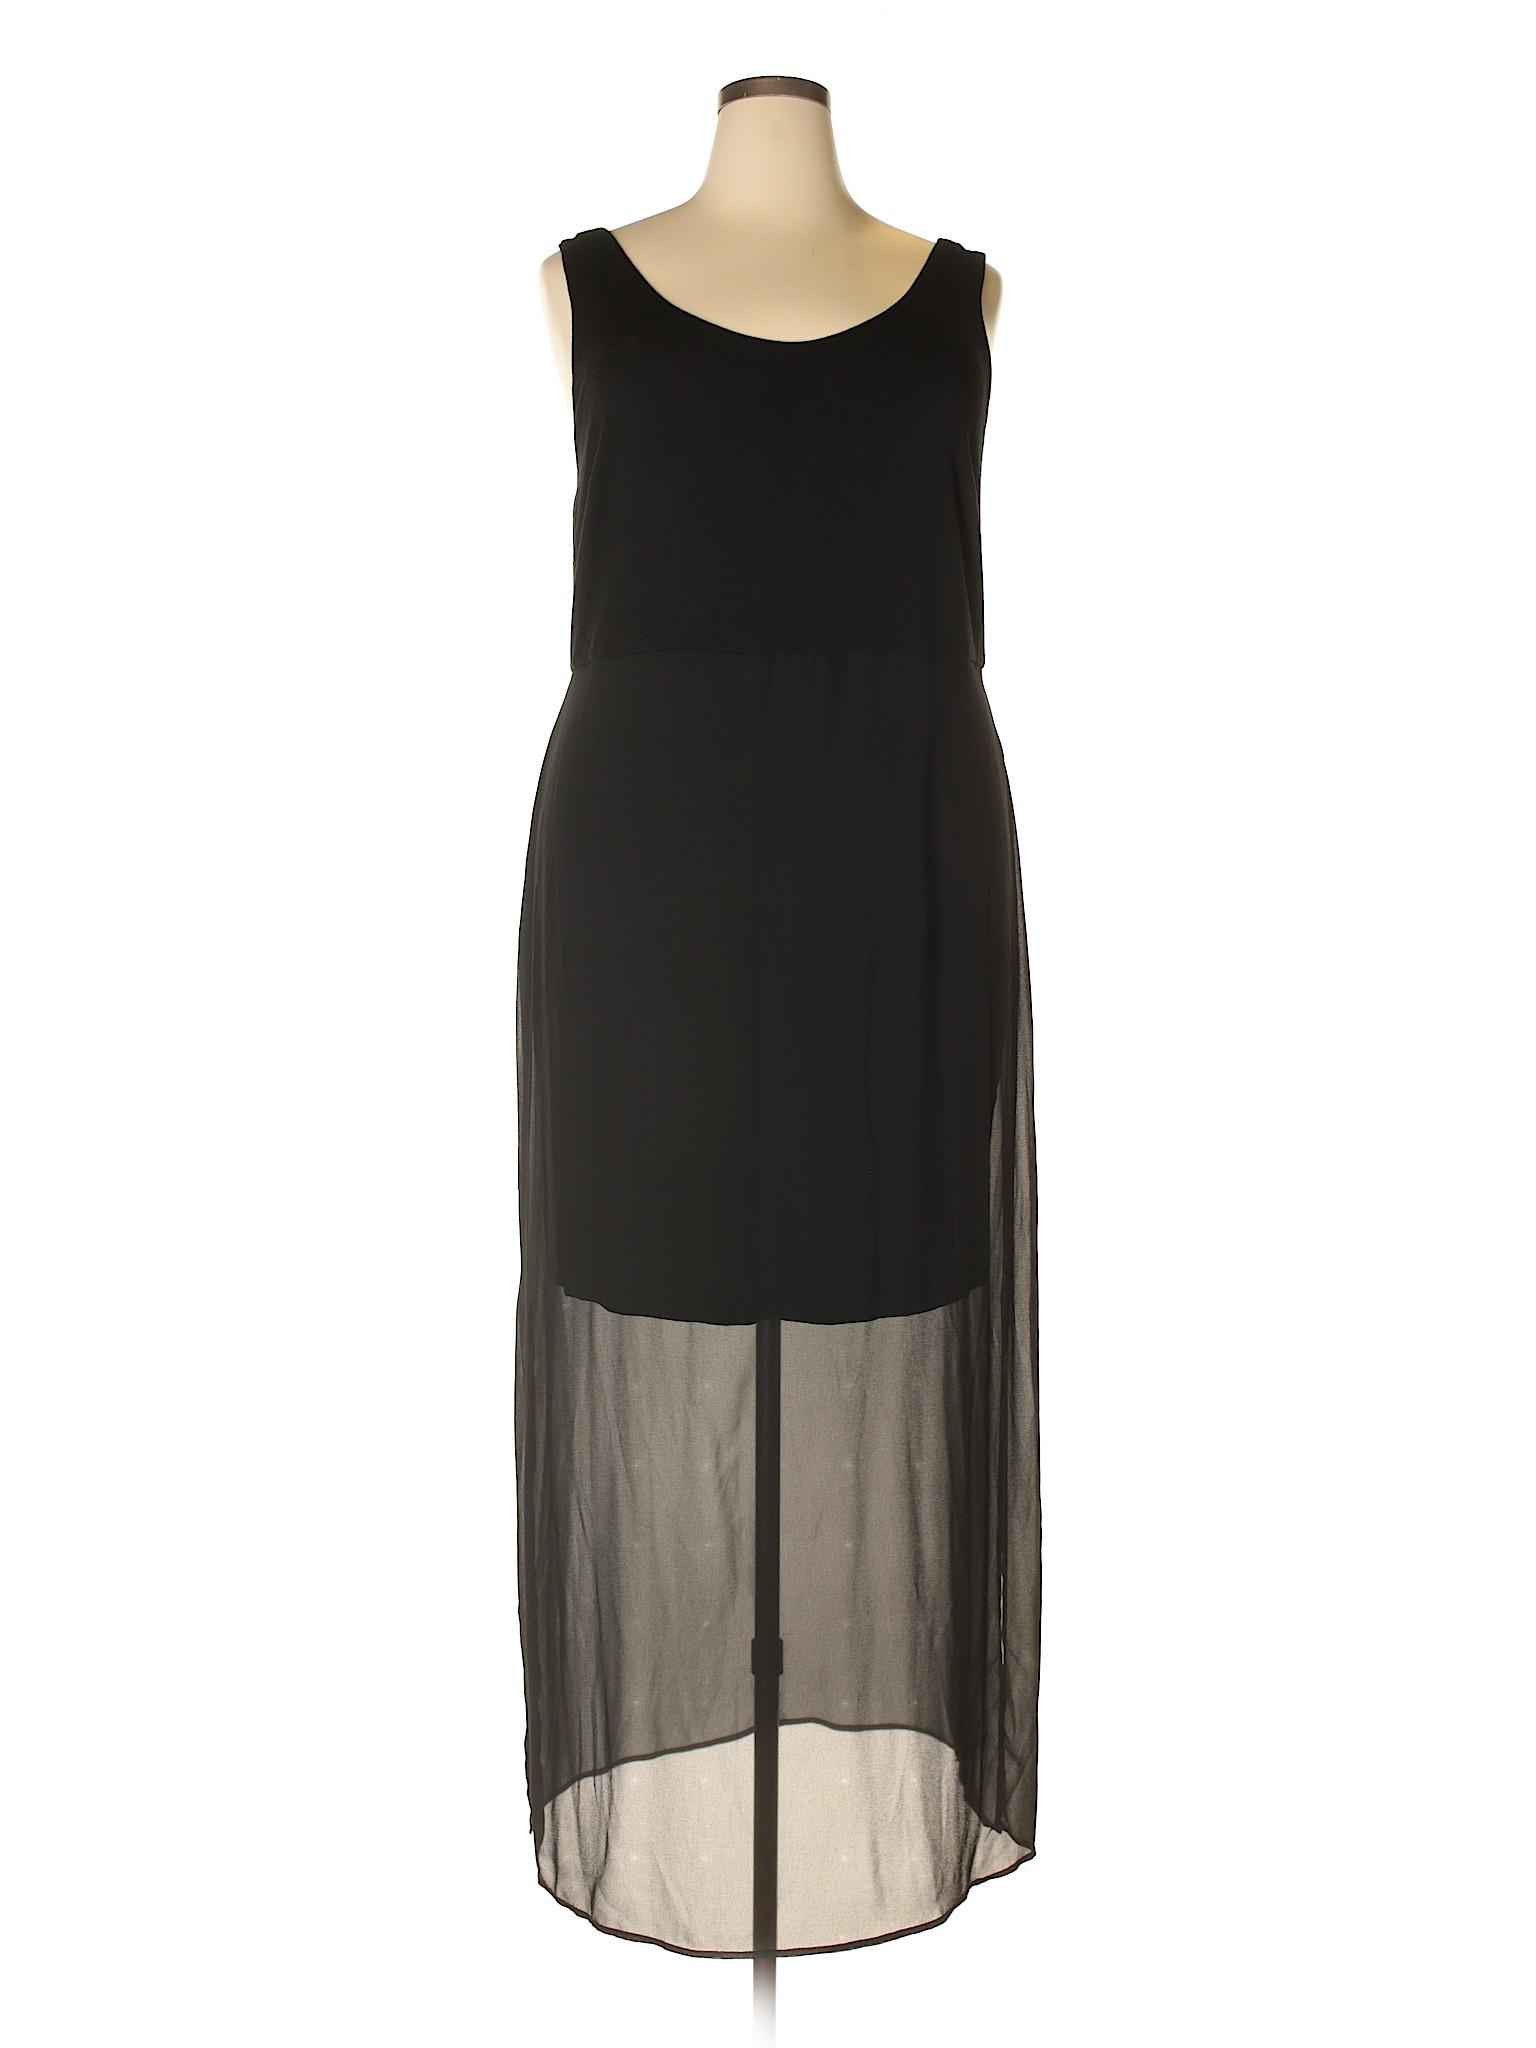 Selling Apt Casual Selling 9 Dress Apt z4Undqxd